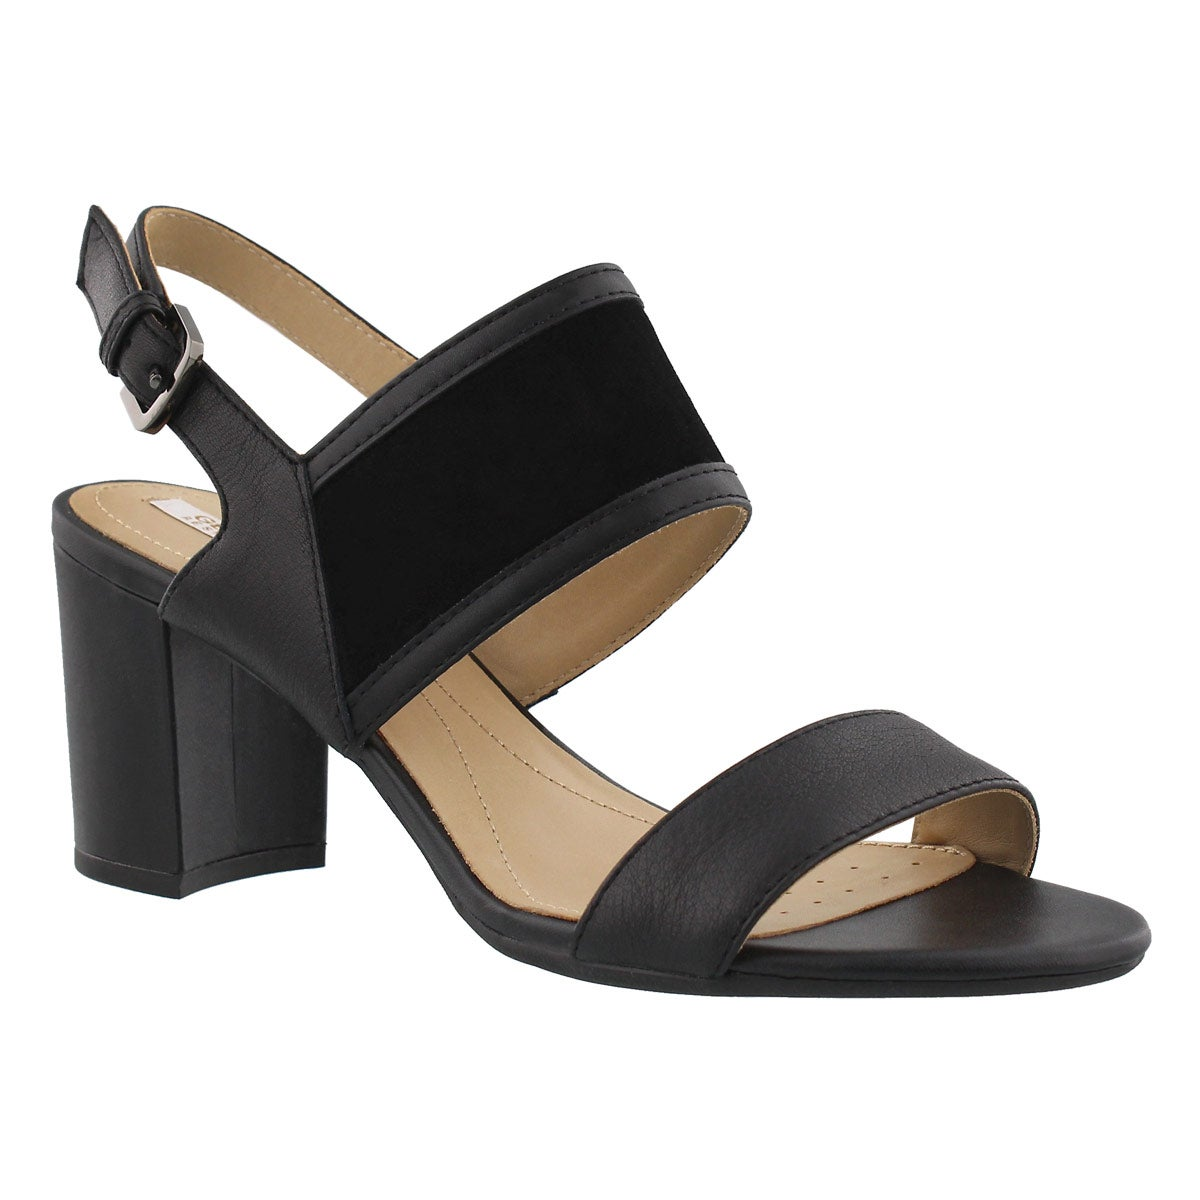 Women's NESA B black dress sandals